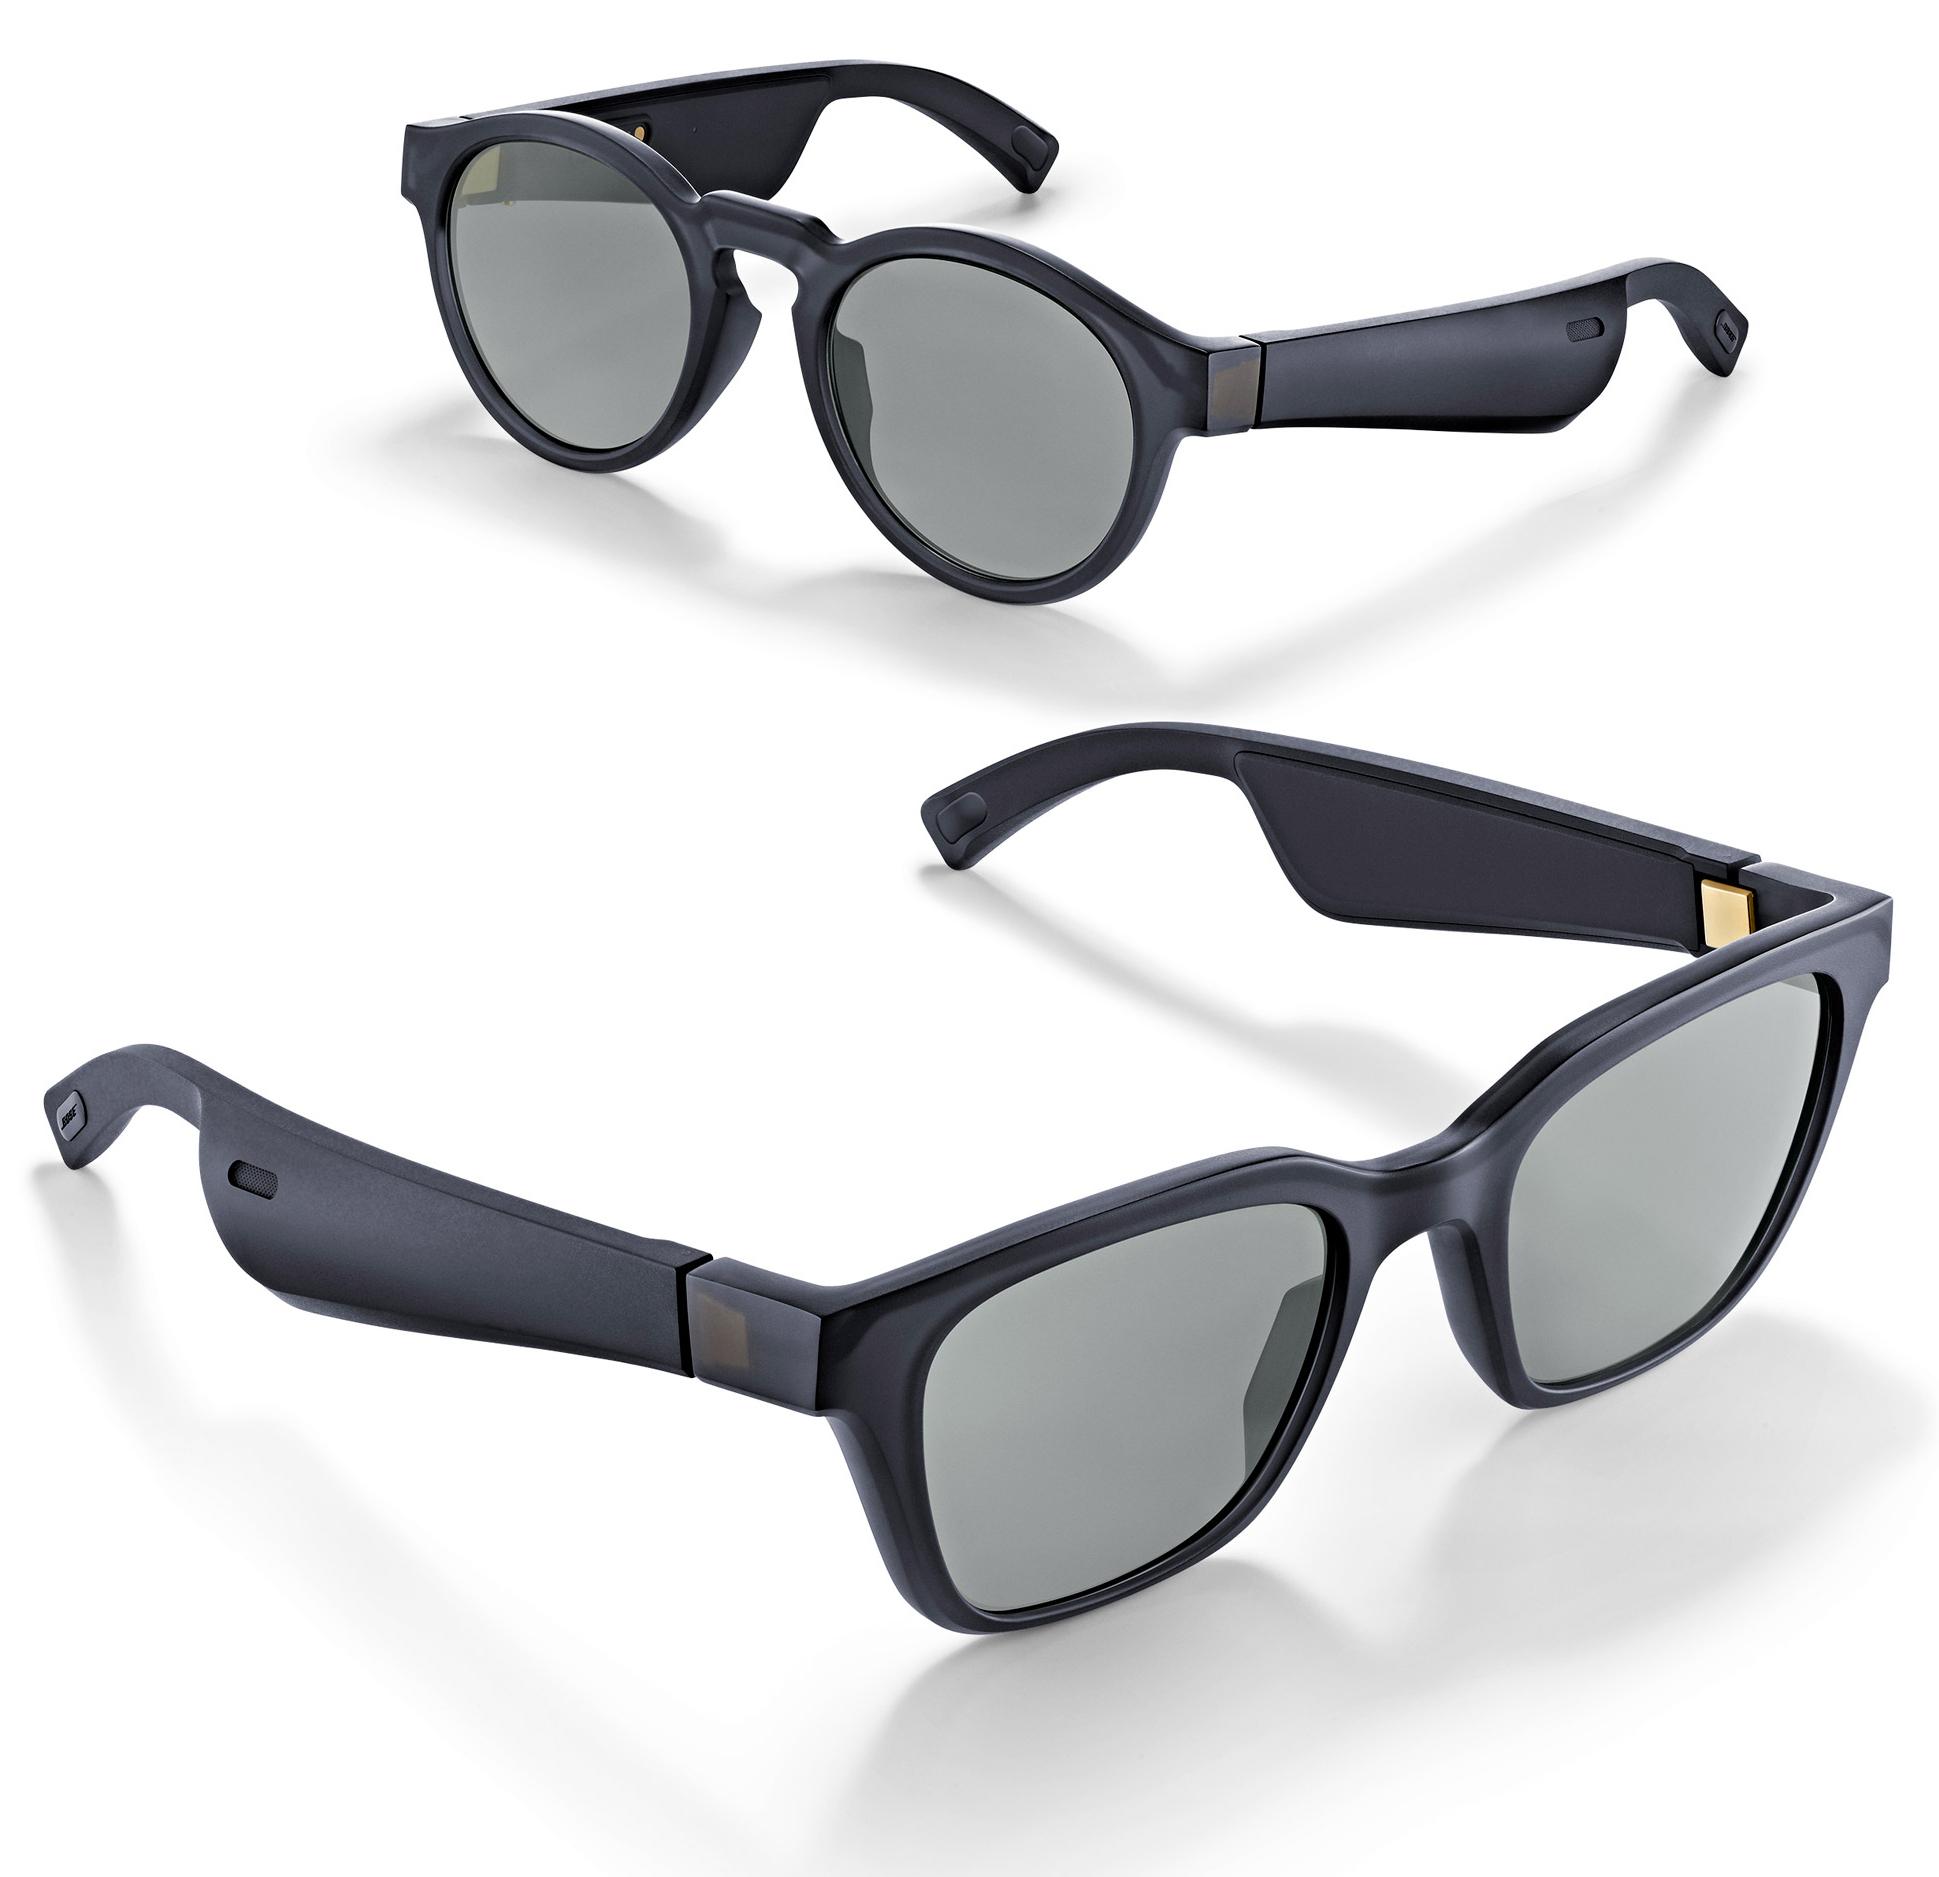 bose-frames-sunglasses-design_dezeen_2364_col_3-1.jpg